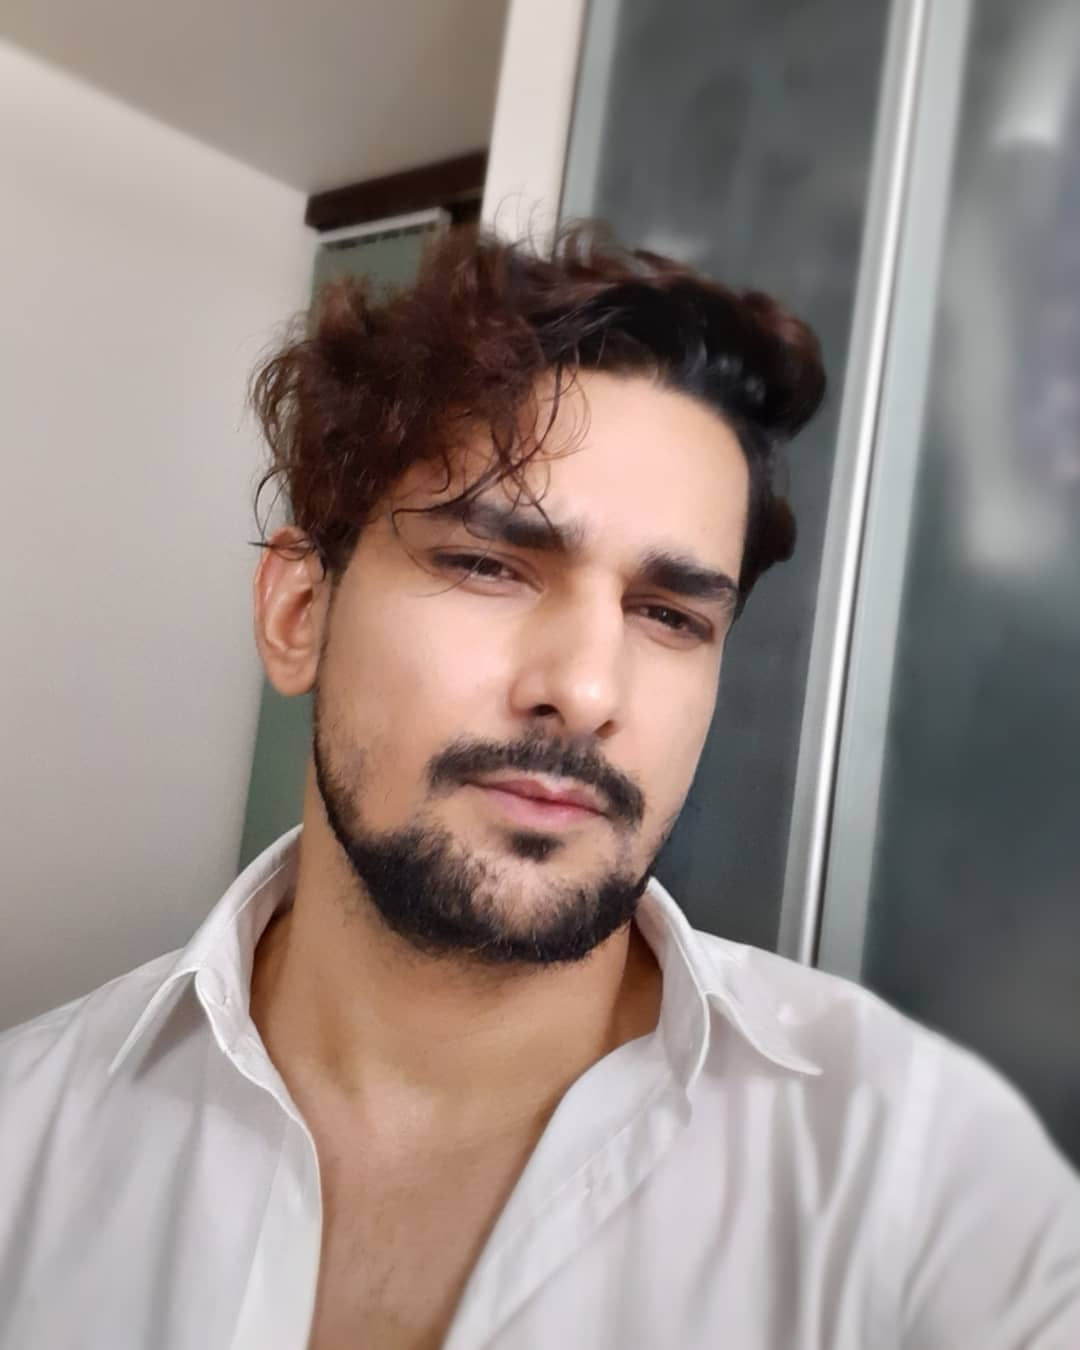 Arjun Fauzdar